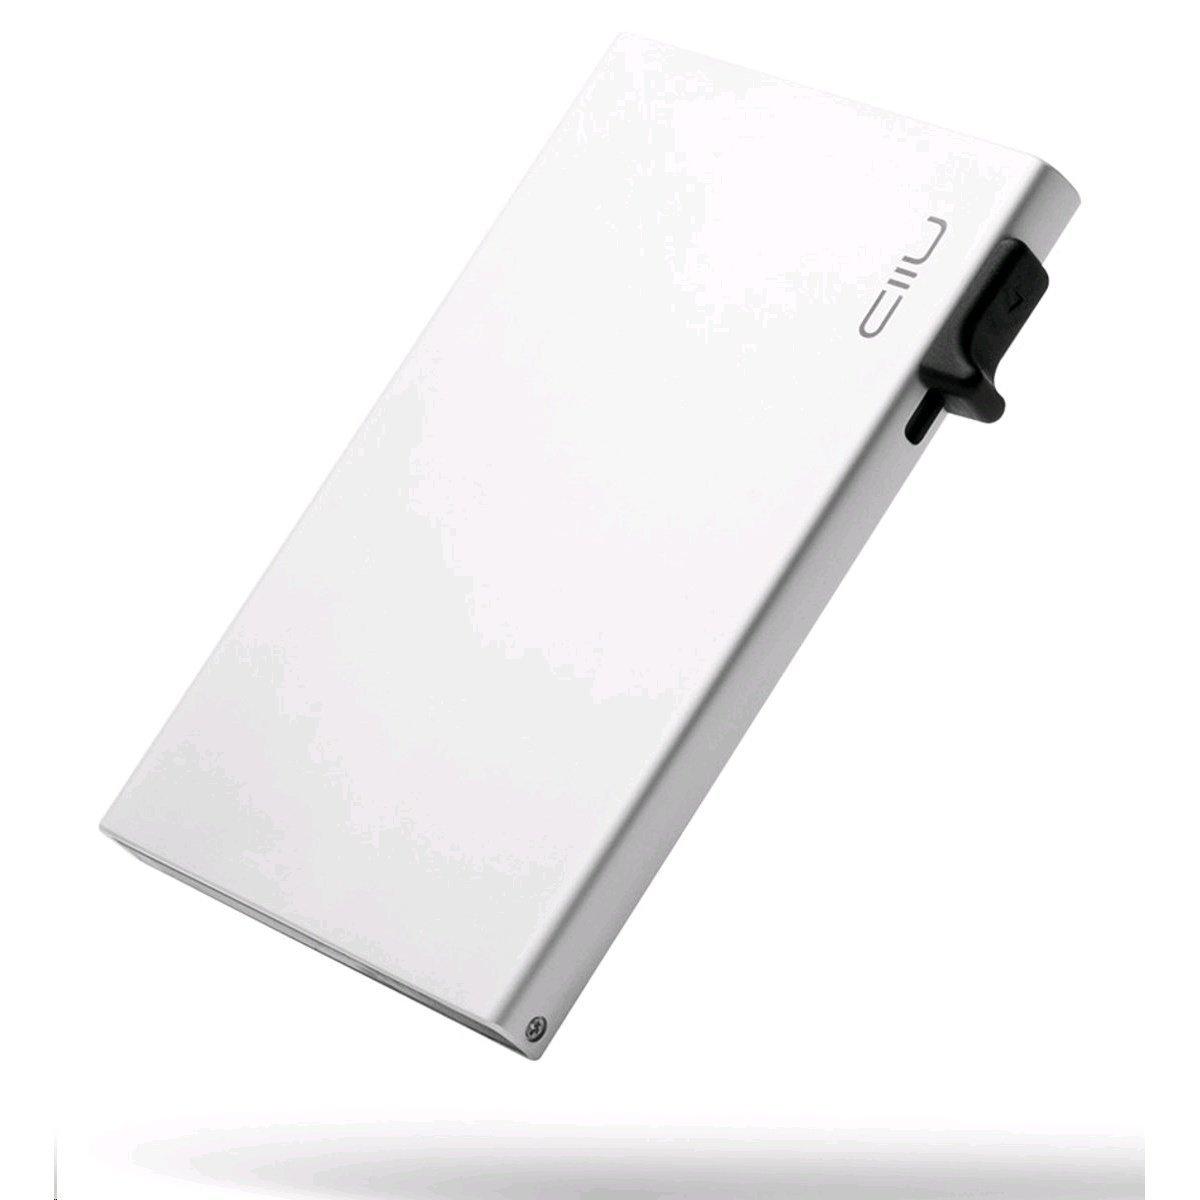 RFID Security Slide Card Protector 晶片卡防盜卡套